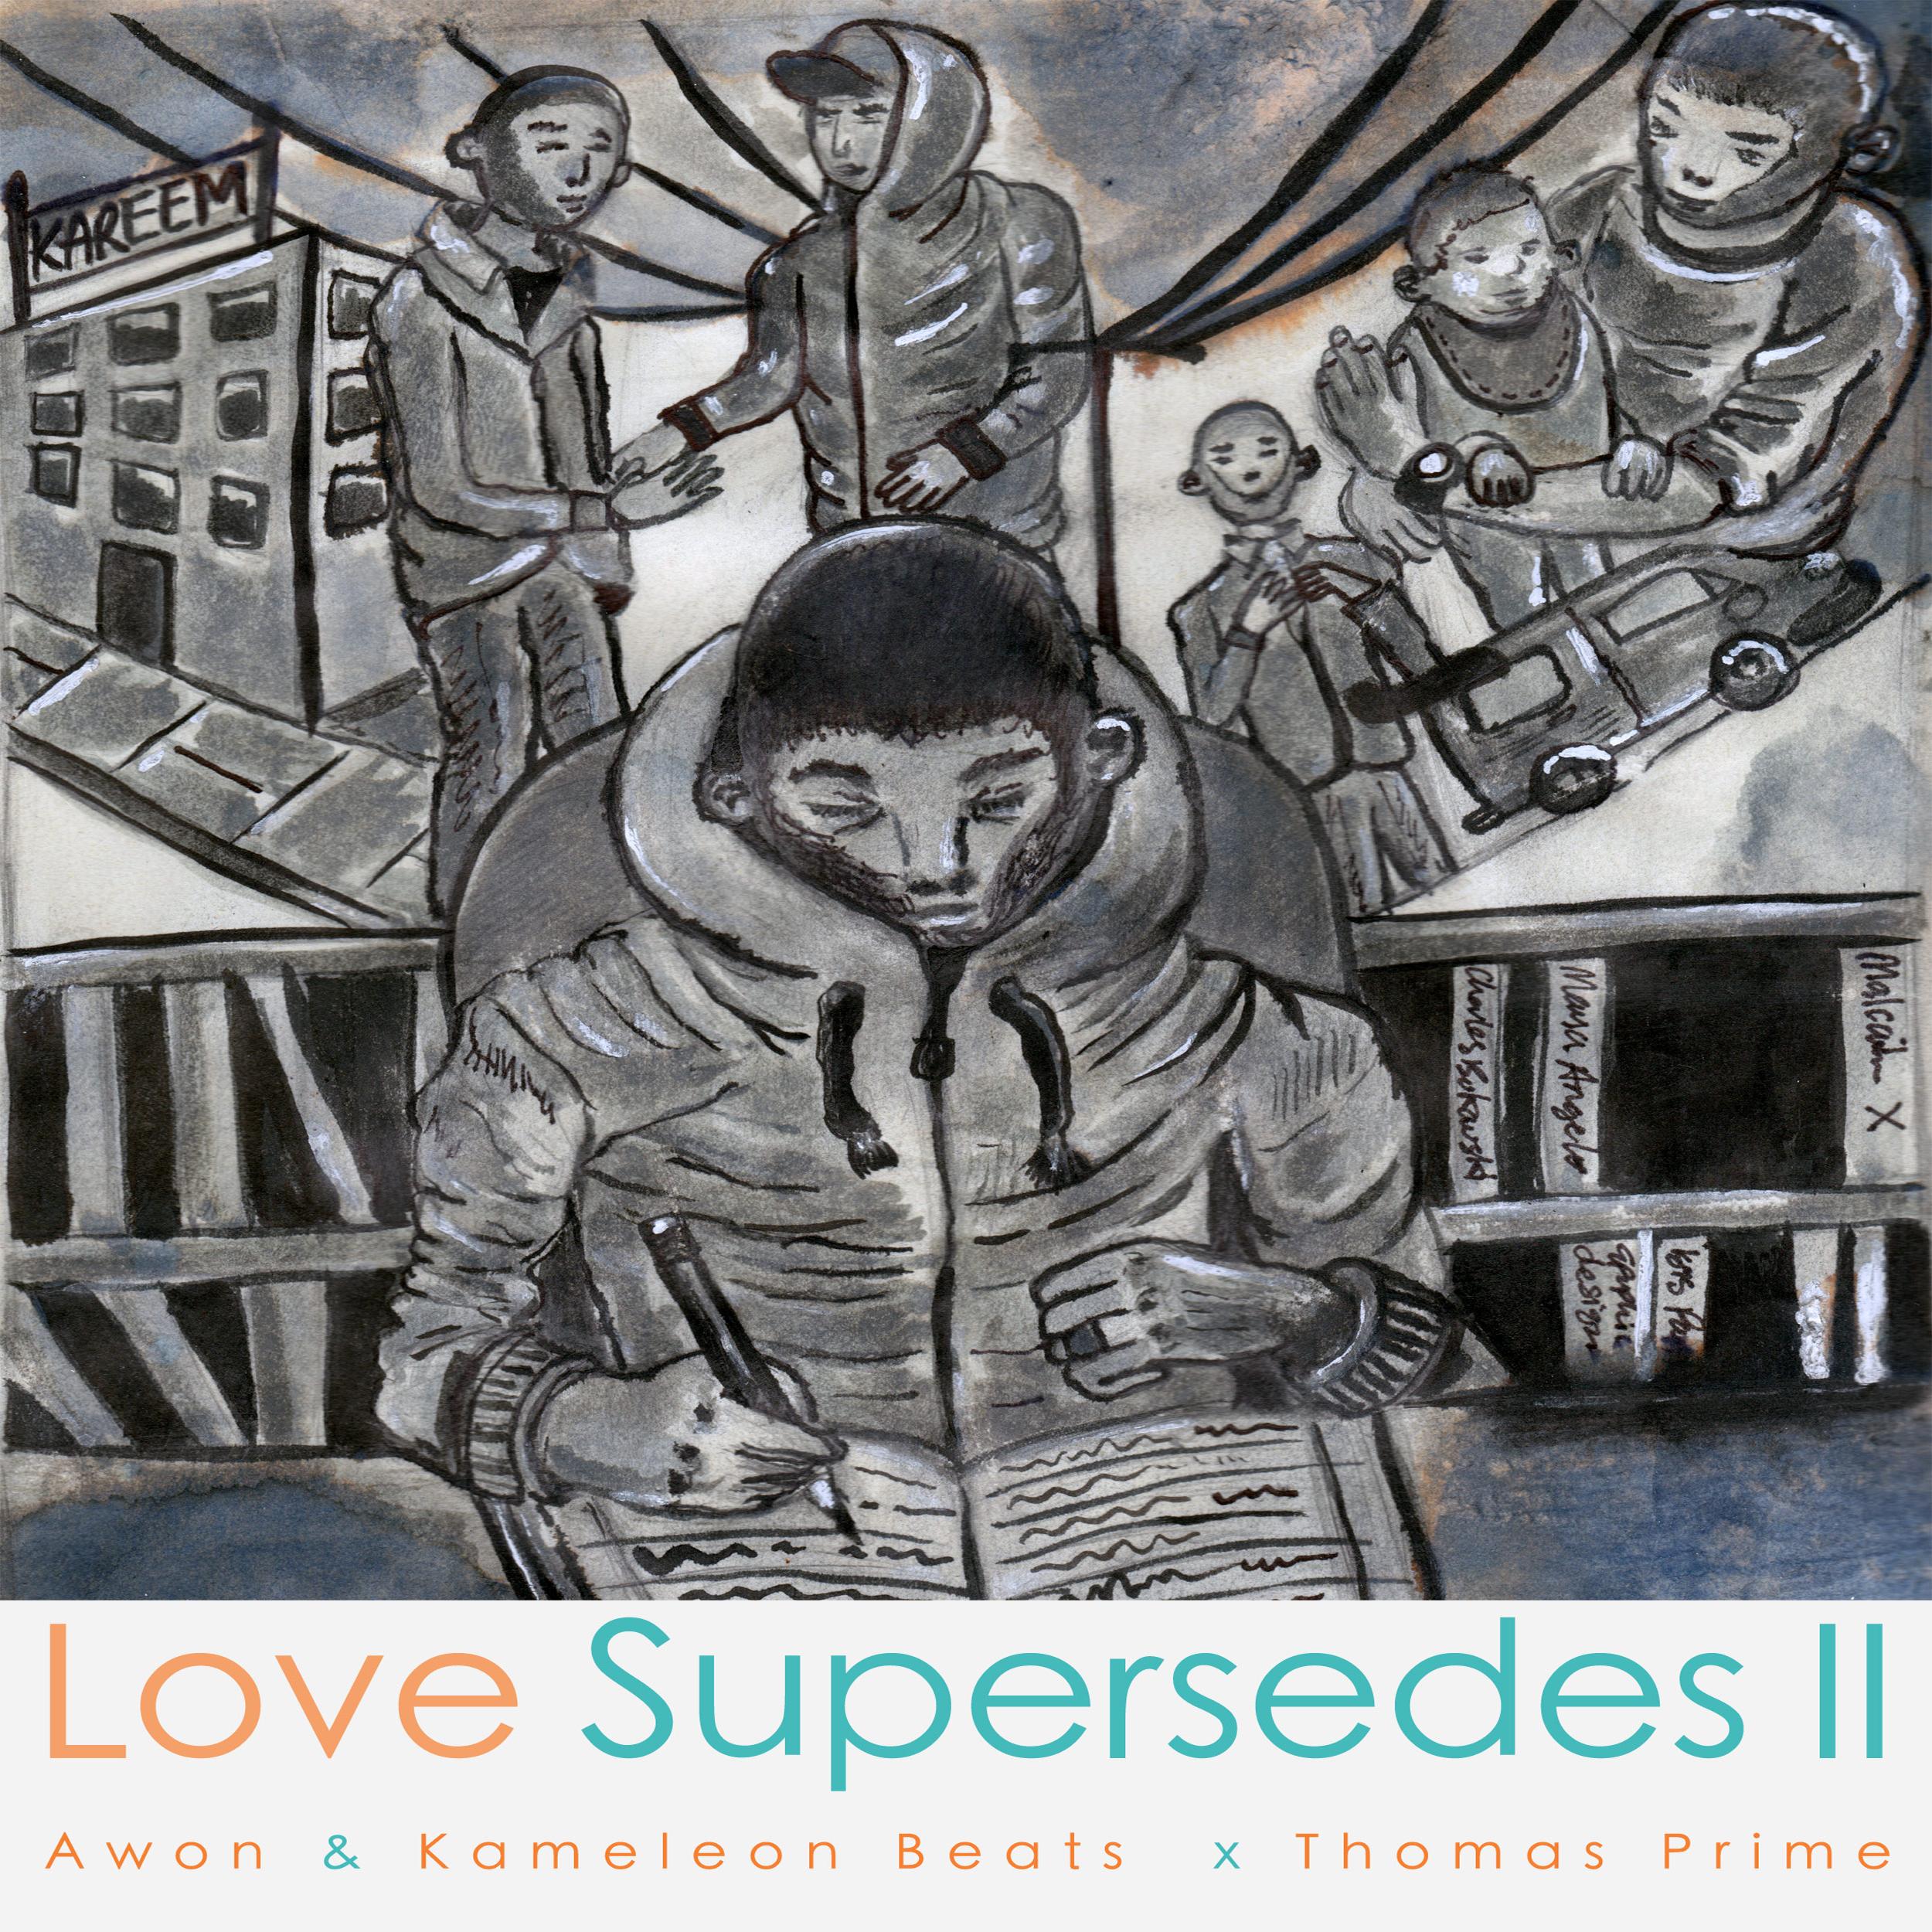 Free Download: Awon, Kameleon Beats & Thomas Prime – Love Supersedes II (2012)